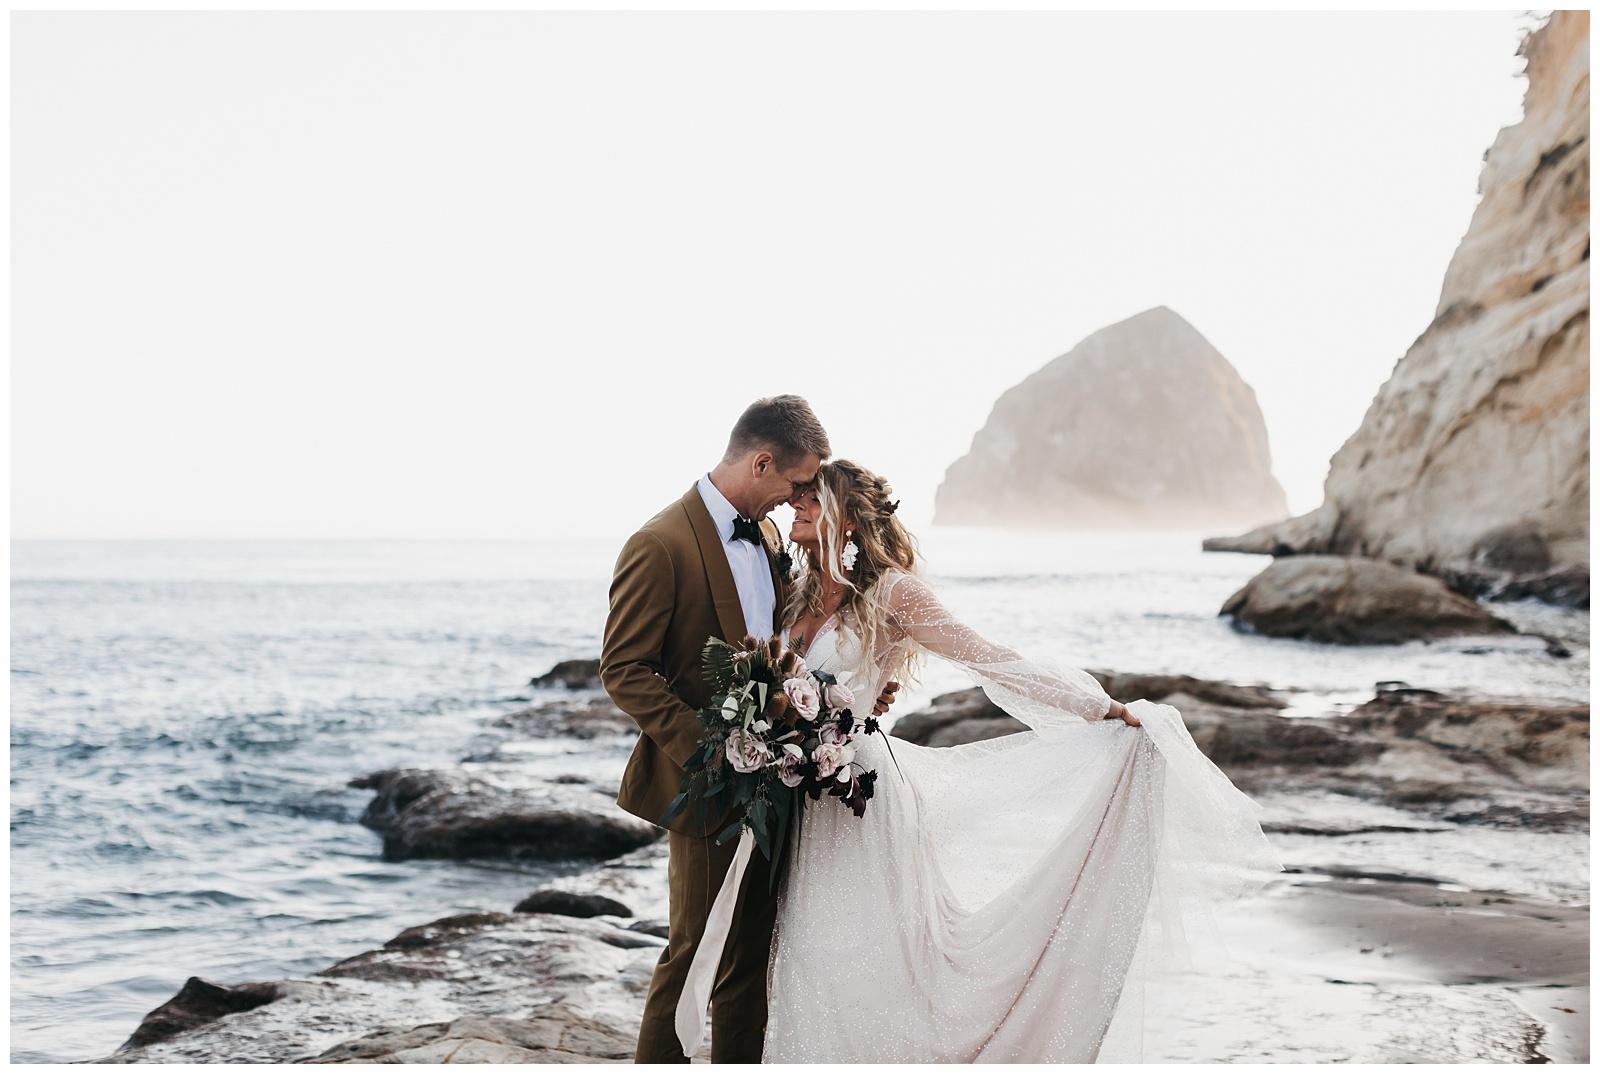 portland-wedding-photographer-pacific-city-elopement-photographer-anniezav_0001.jpg